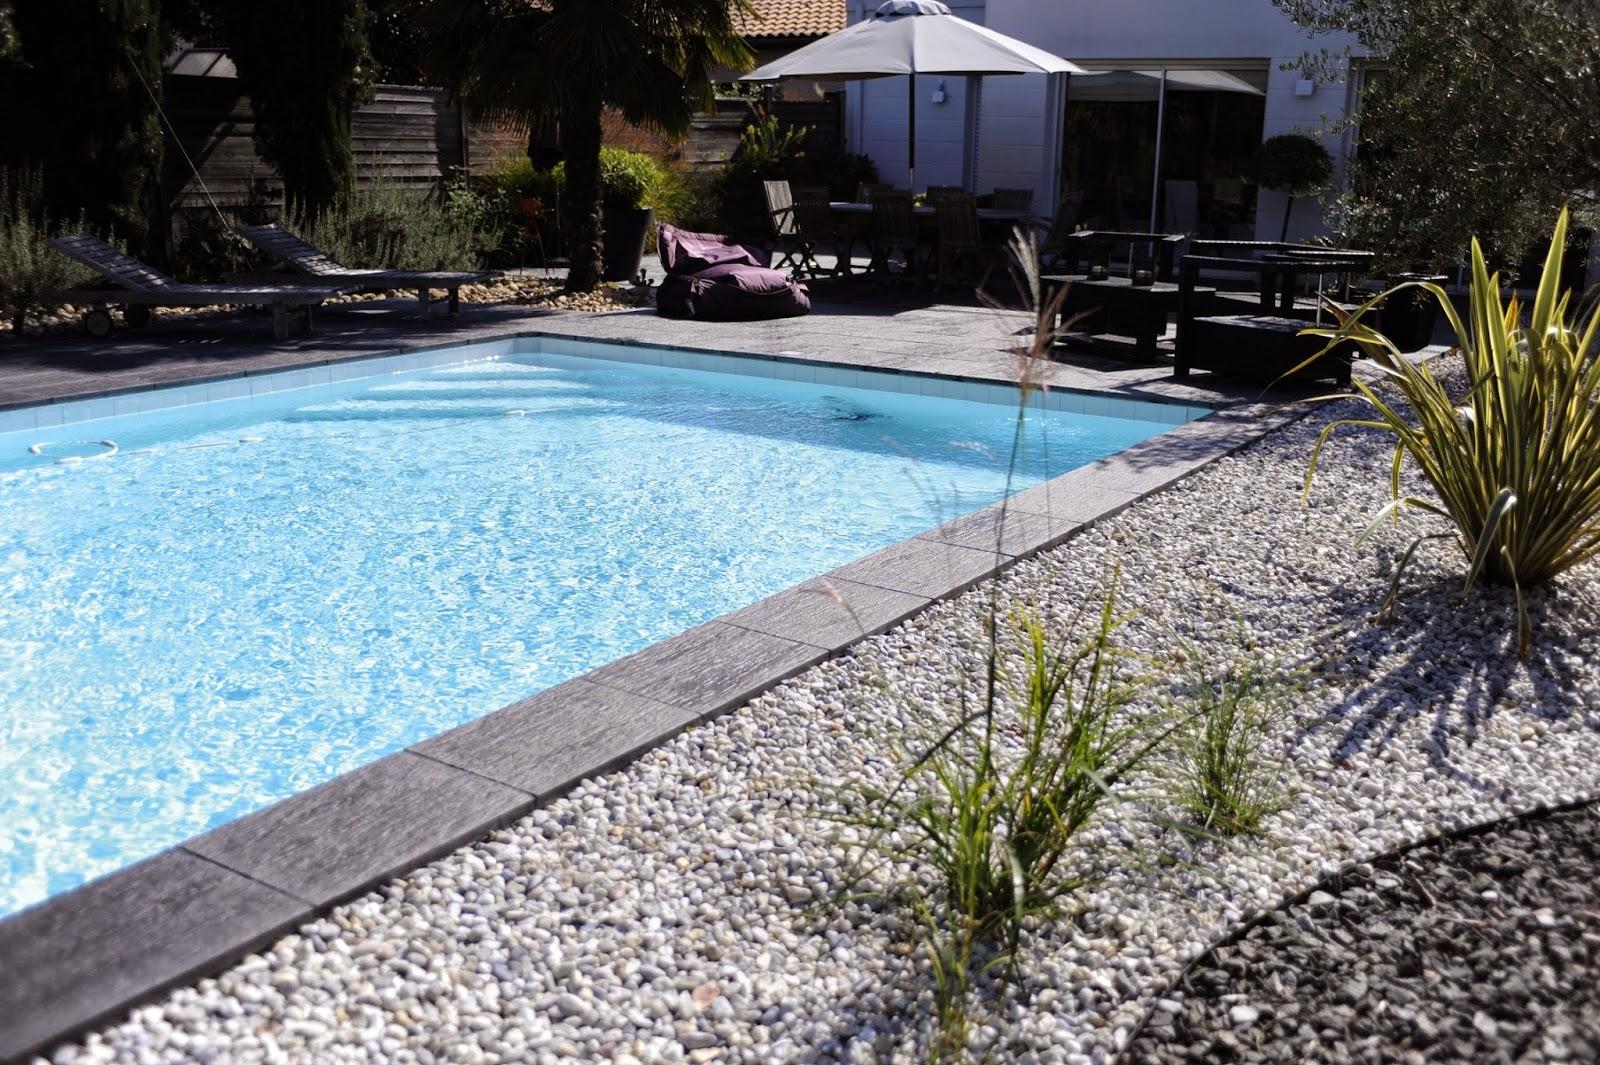 construction de piscines entretenir sa piscine. Black Bedroom Furniture Sets. Home Design Ideas